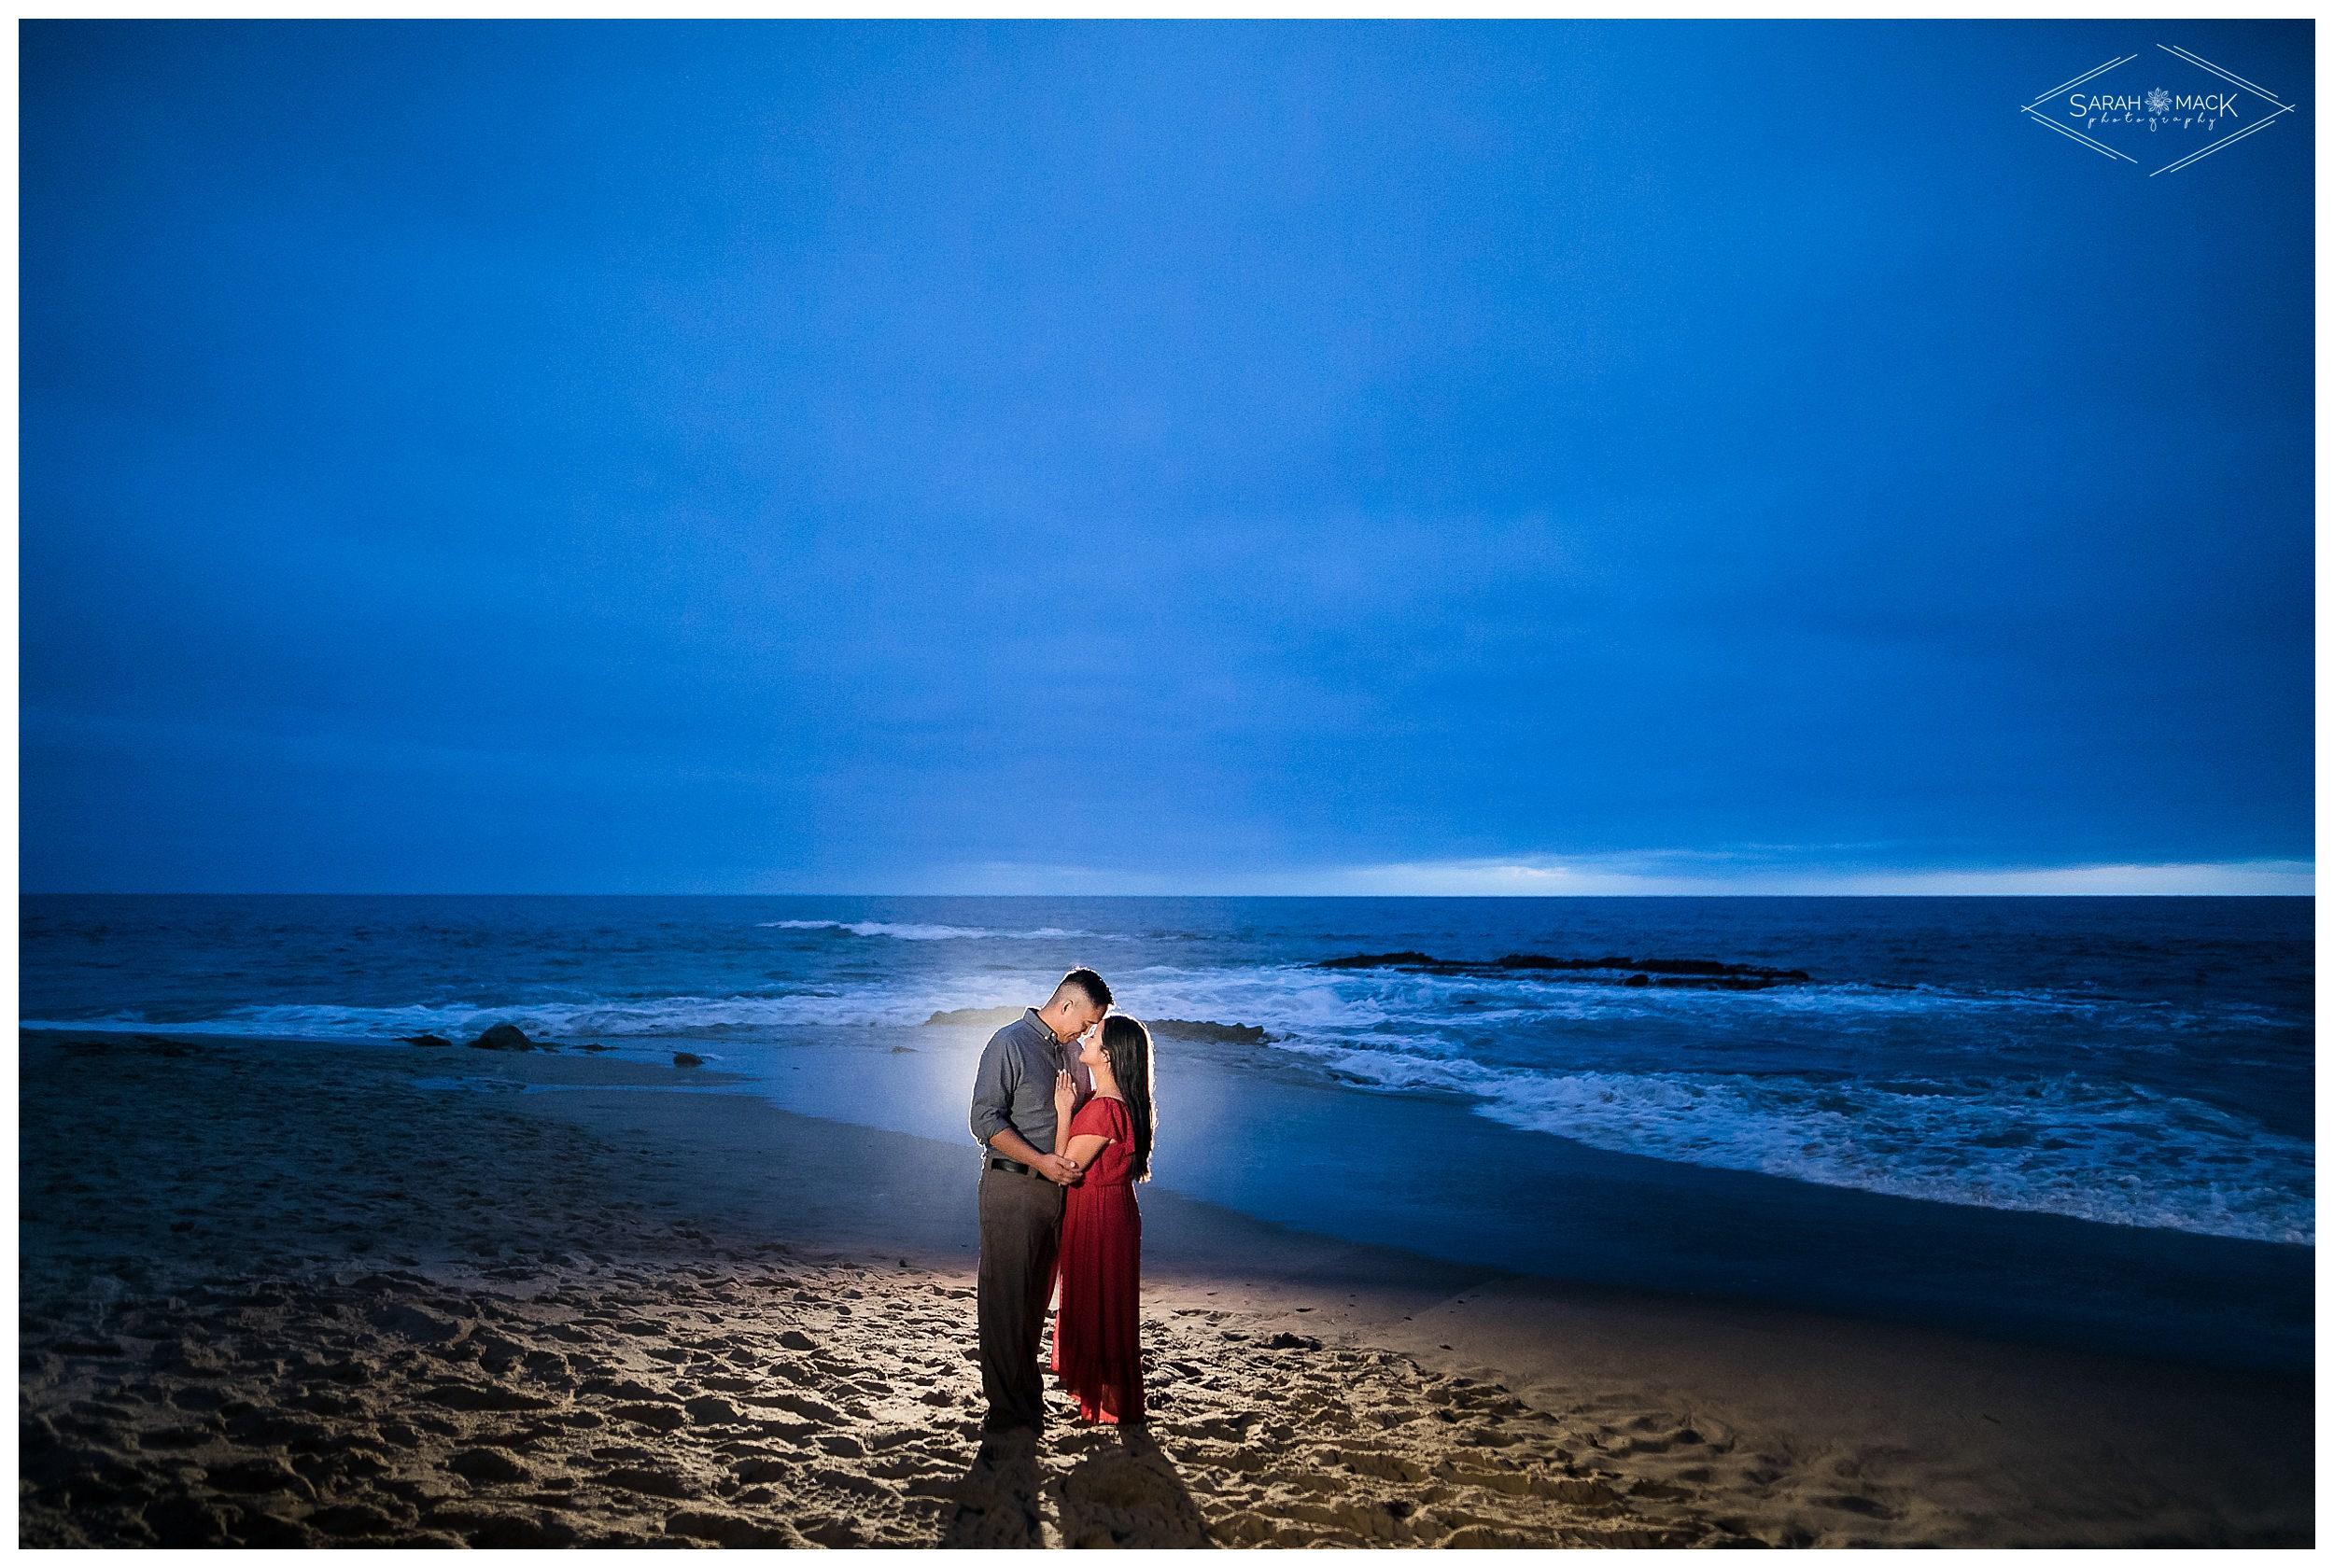 LE_Orange-County-Engagement-Photography 129.jpg